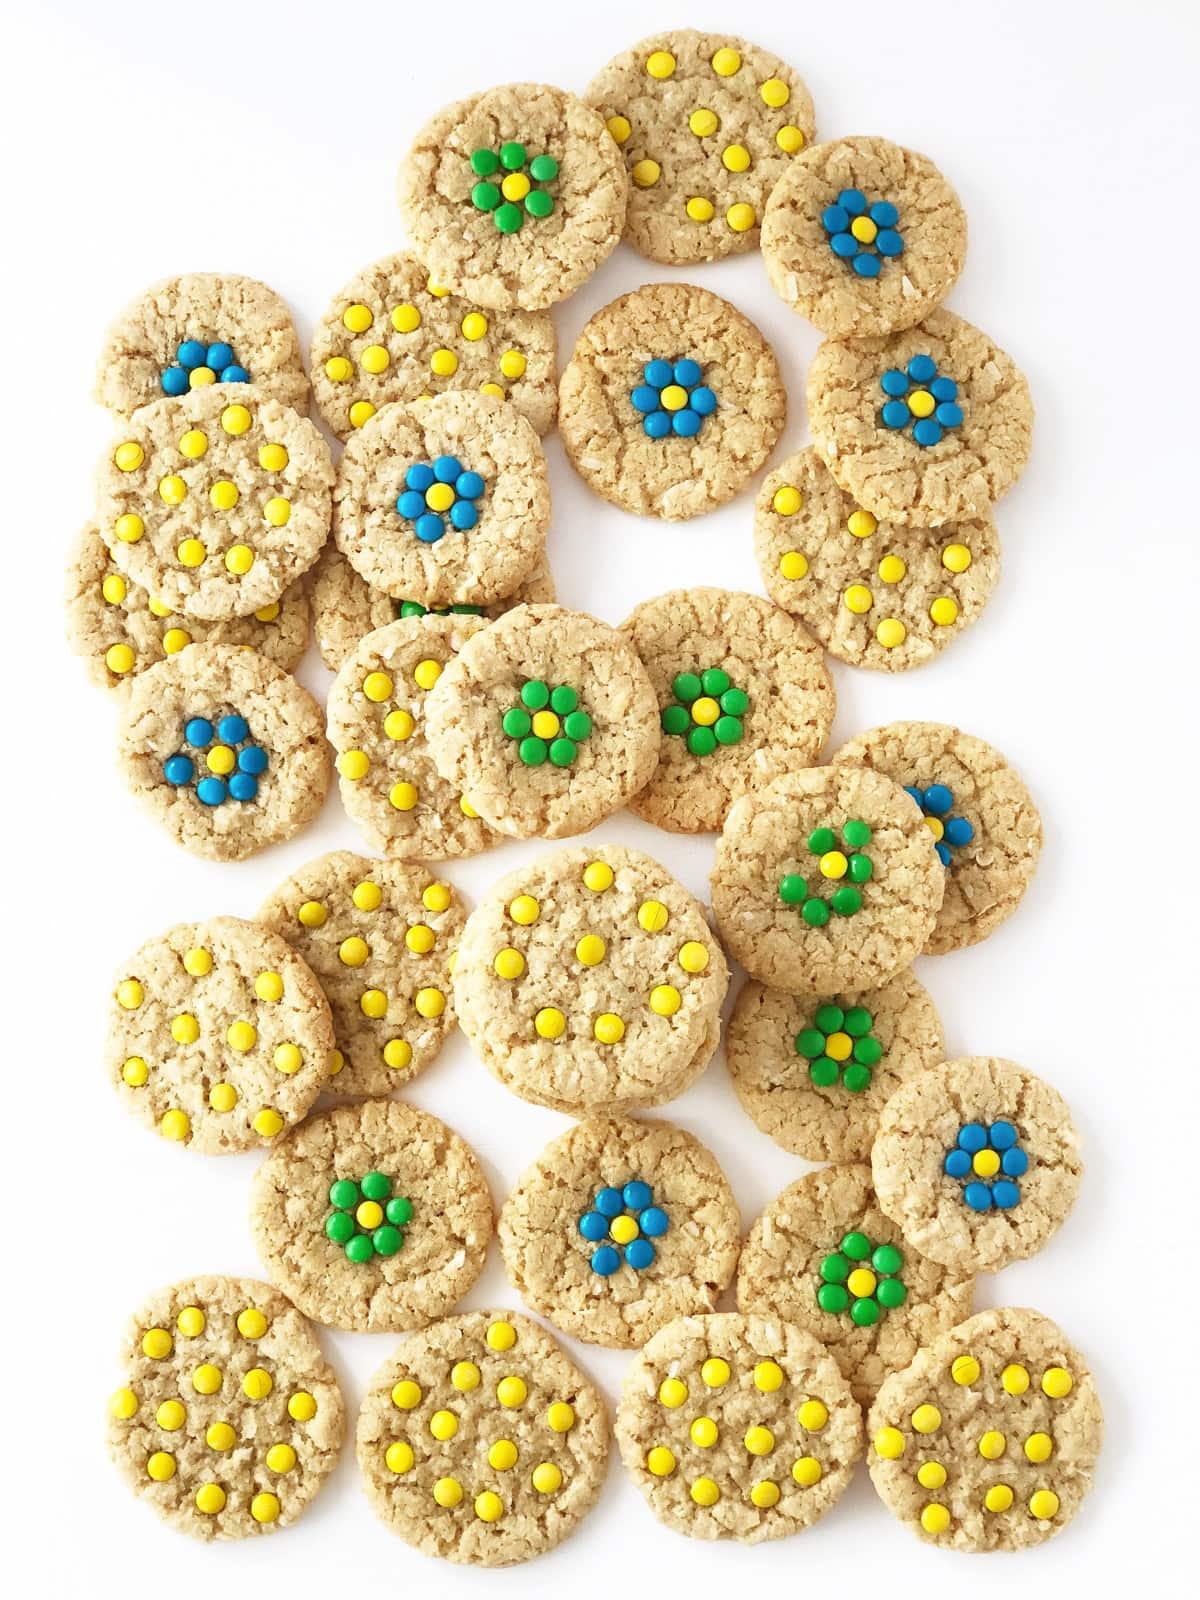 Summer Sunshine Cookies